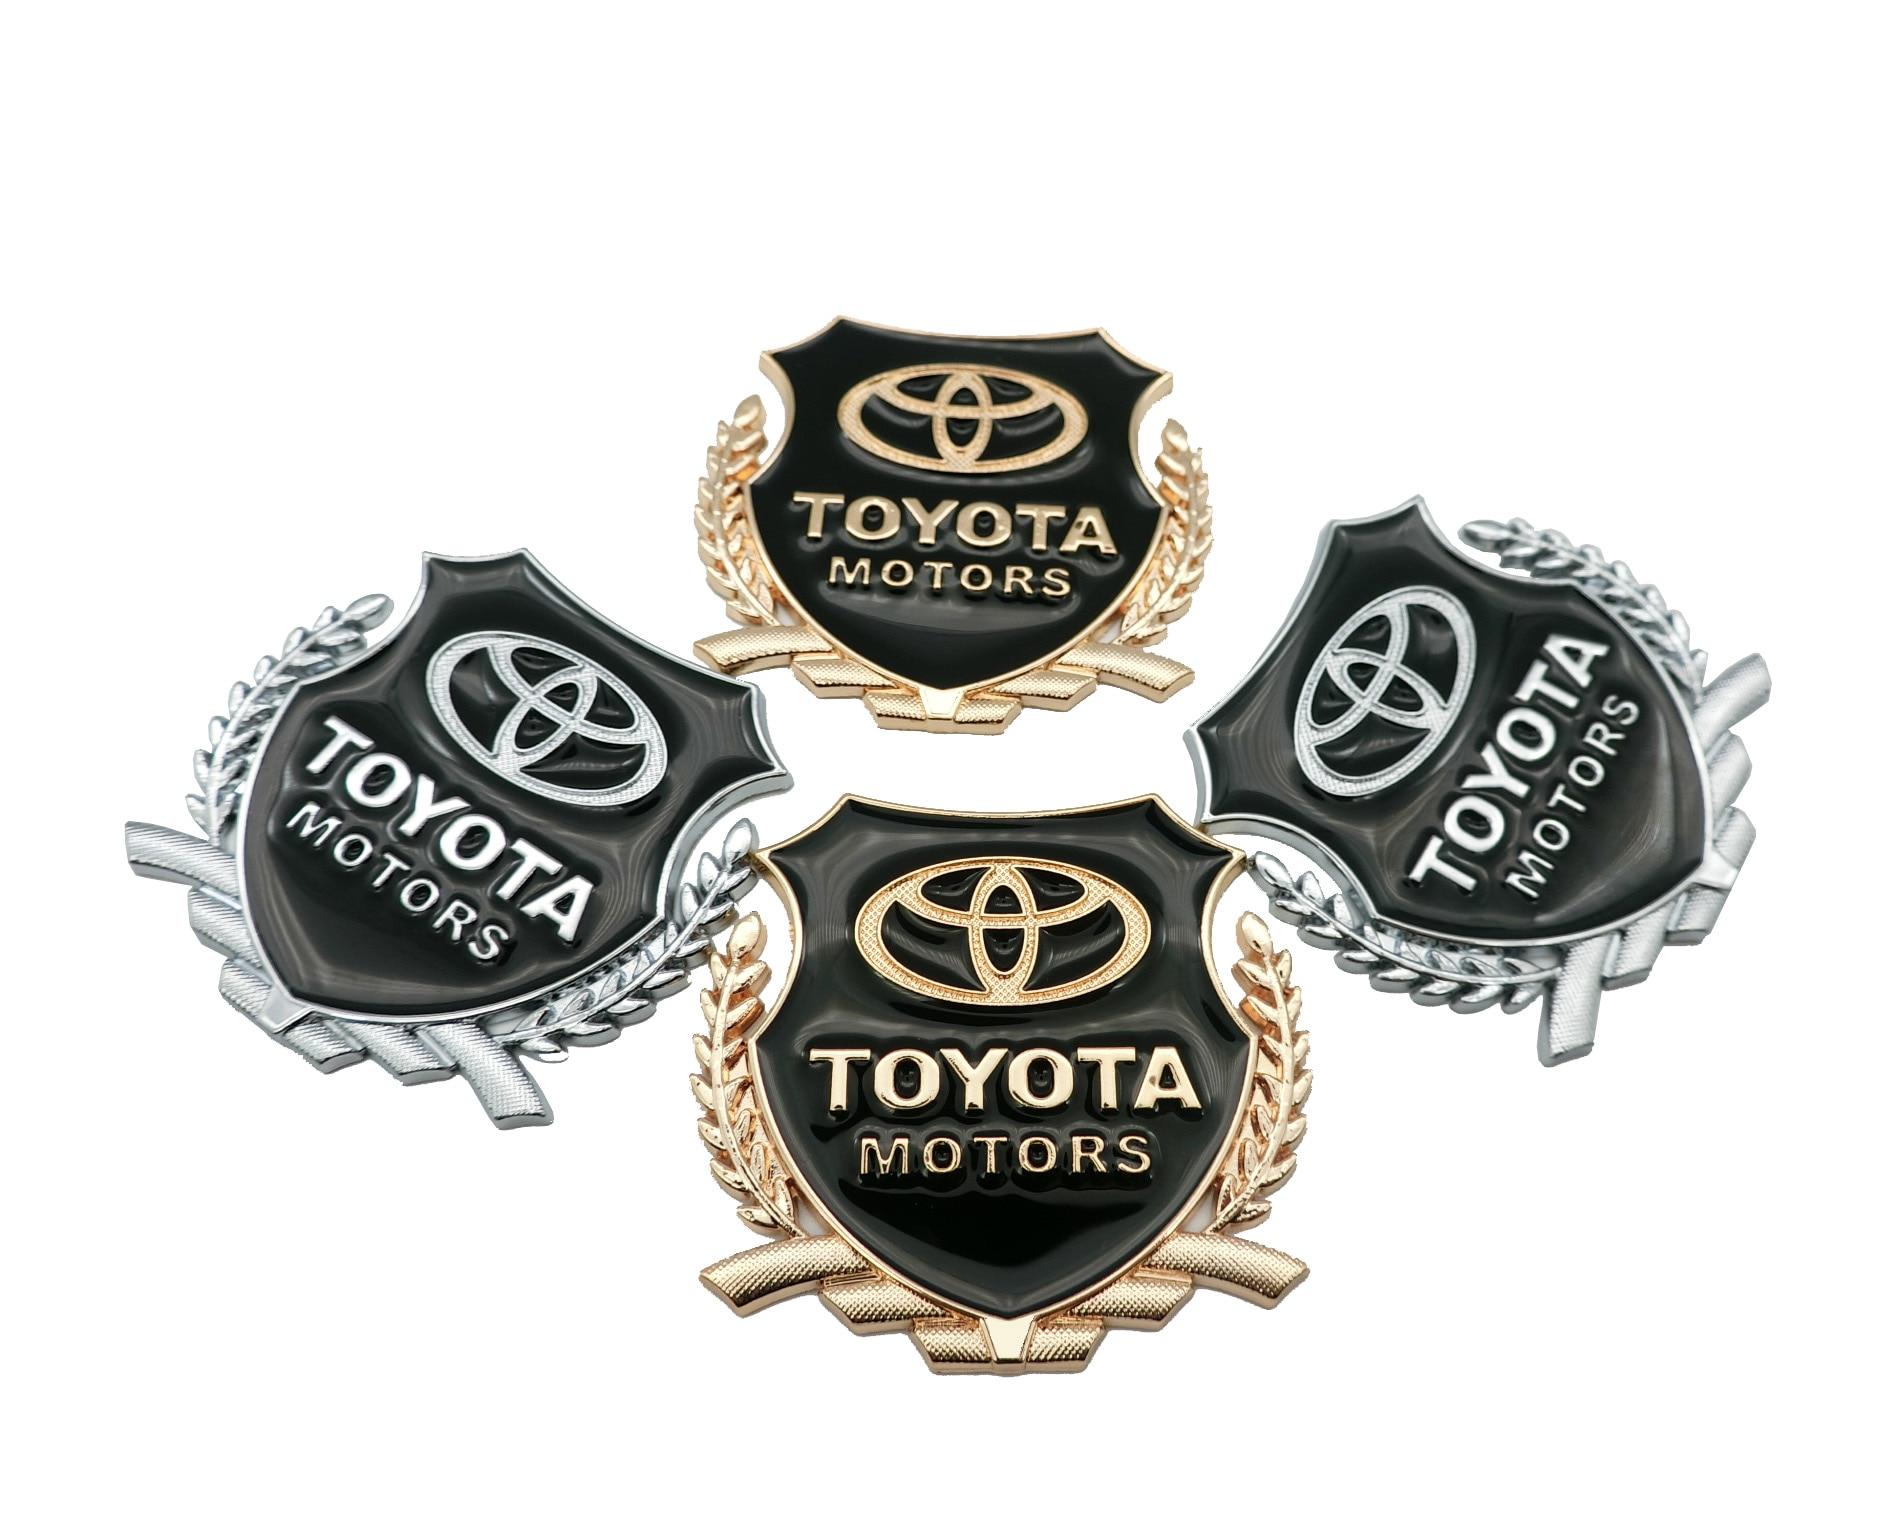 Metal Car Side Alloy Car Side Sticker Door Badge Stickers Side Window Emblem Decals For Toyota Camry Corolla RAV4 Highlander